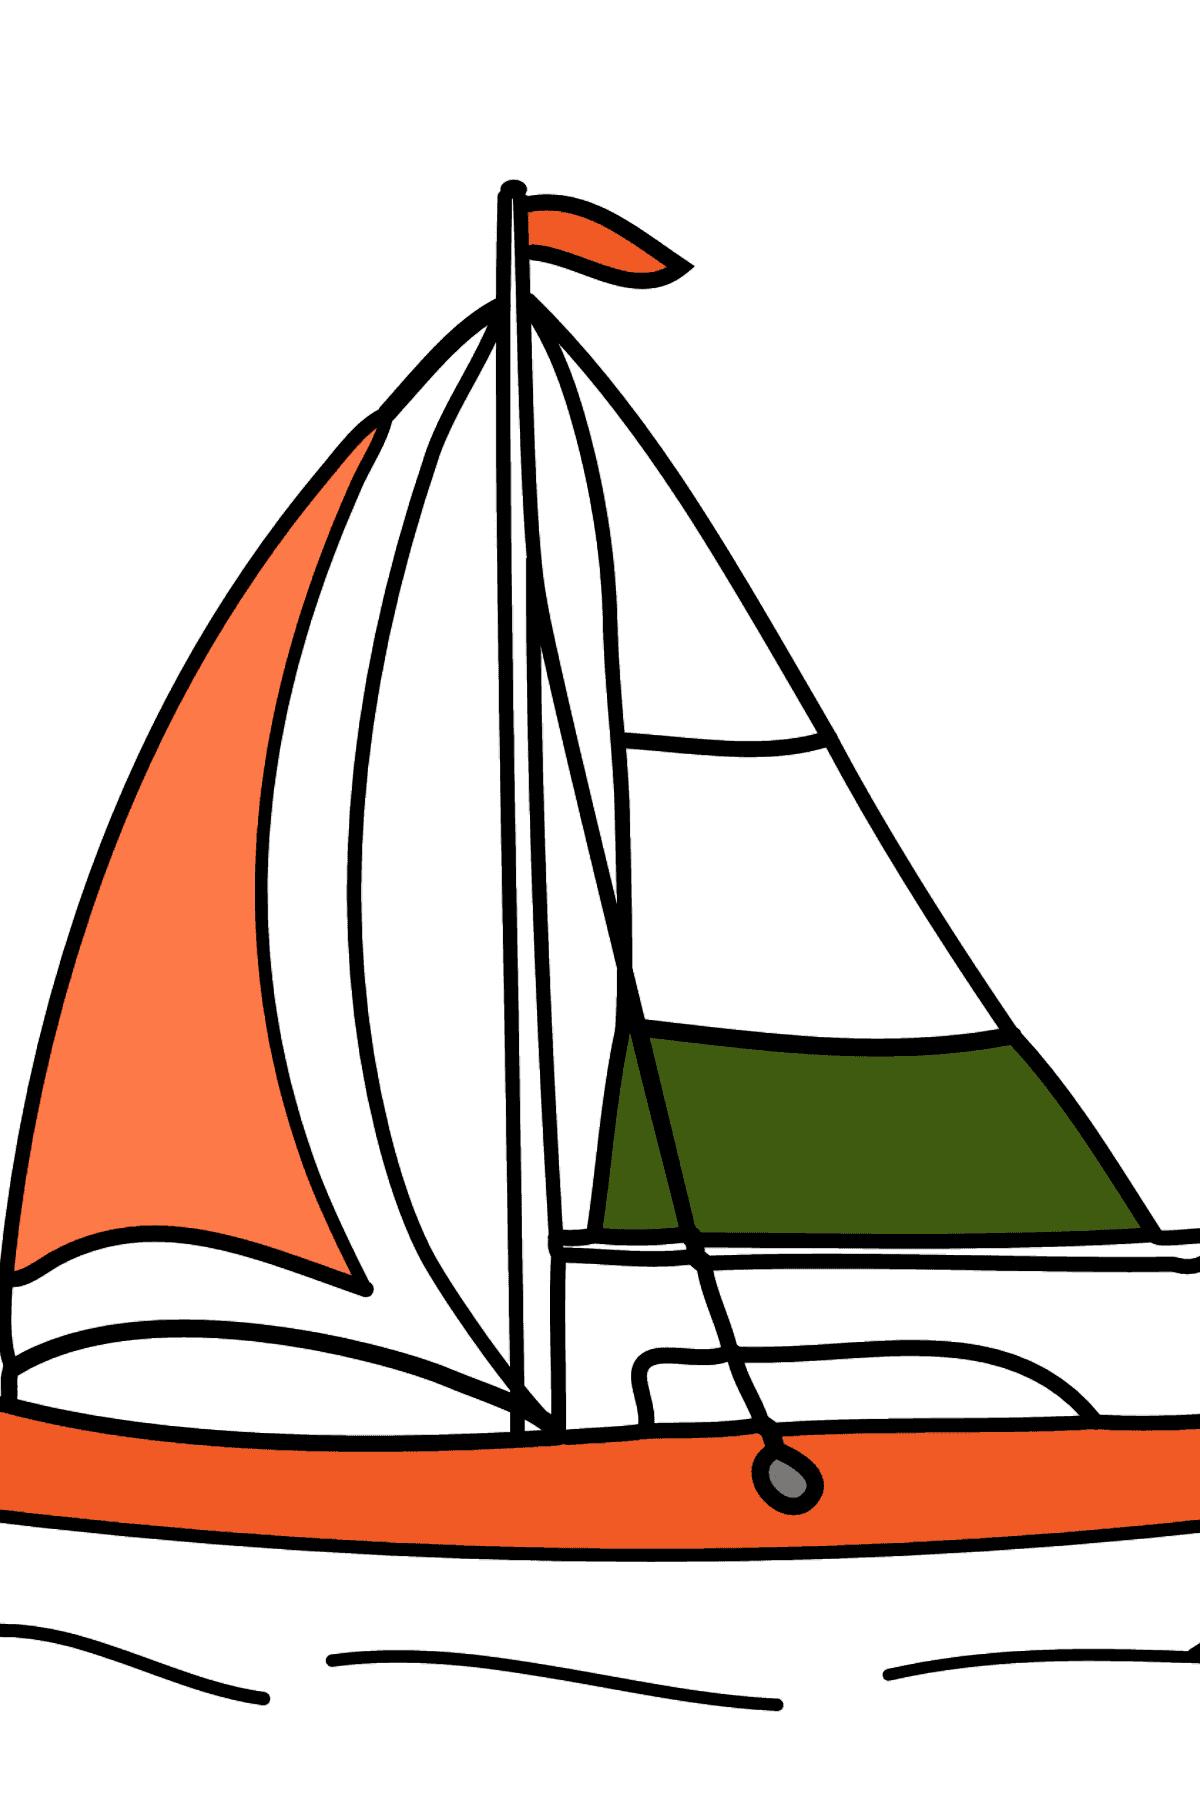 Раскраска парусная лодка - Раскраски для Детей